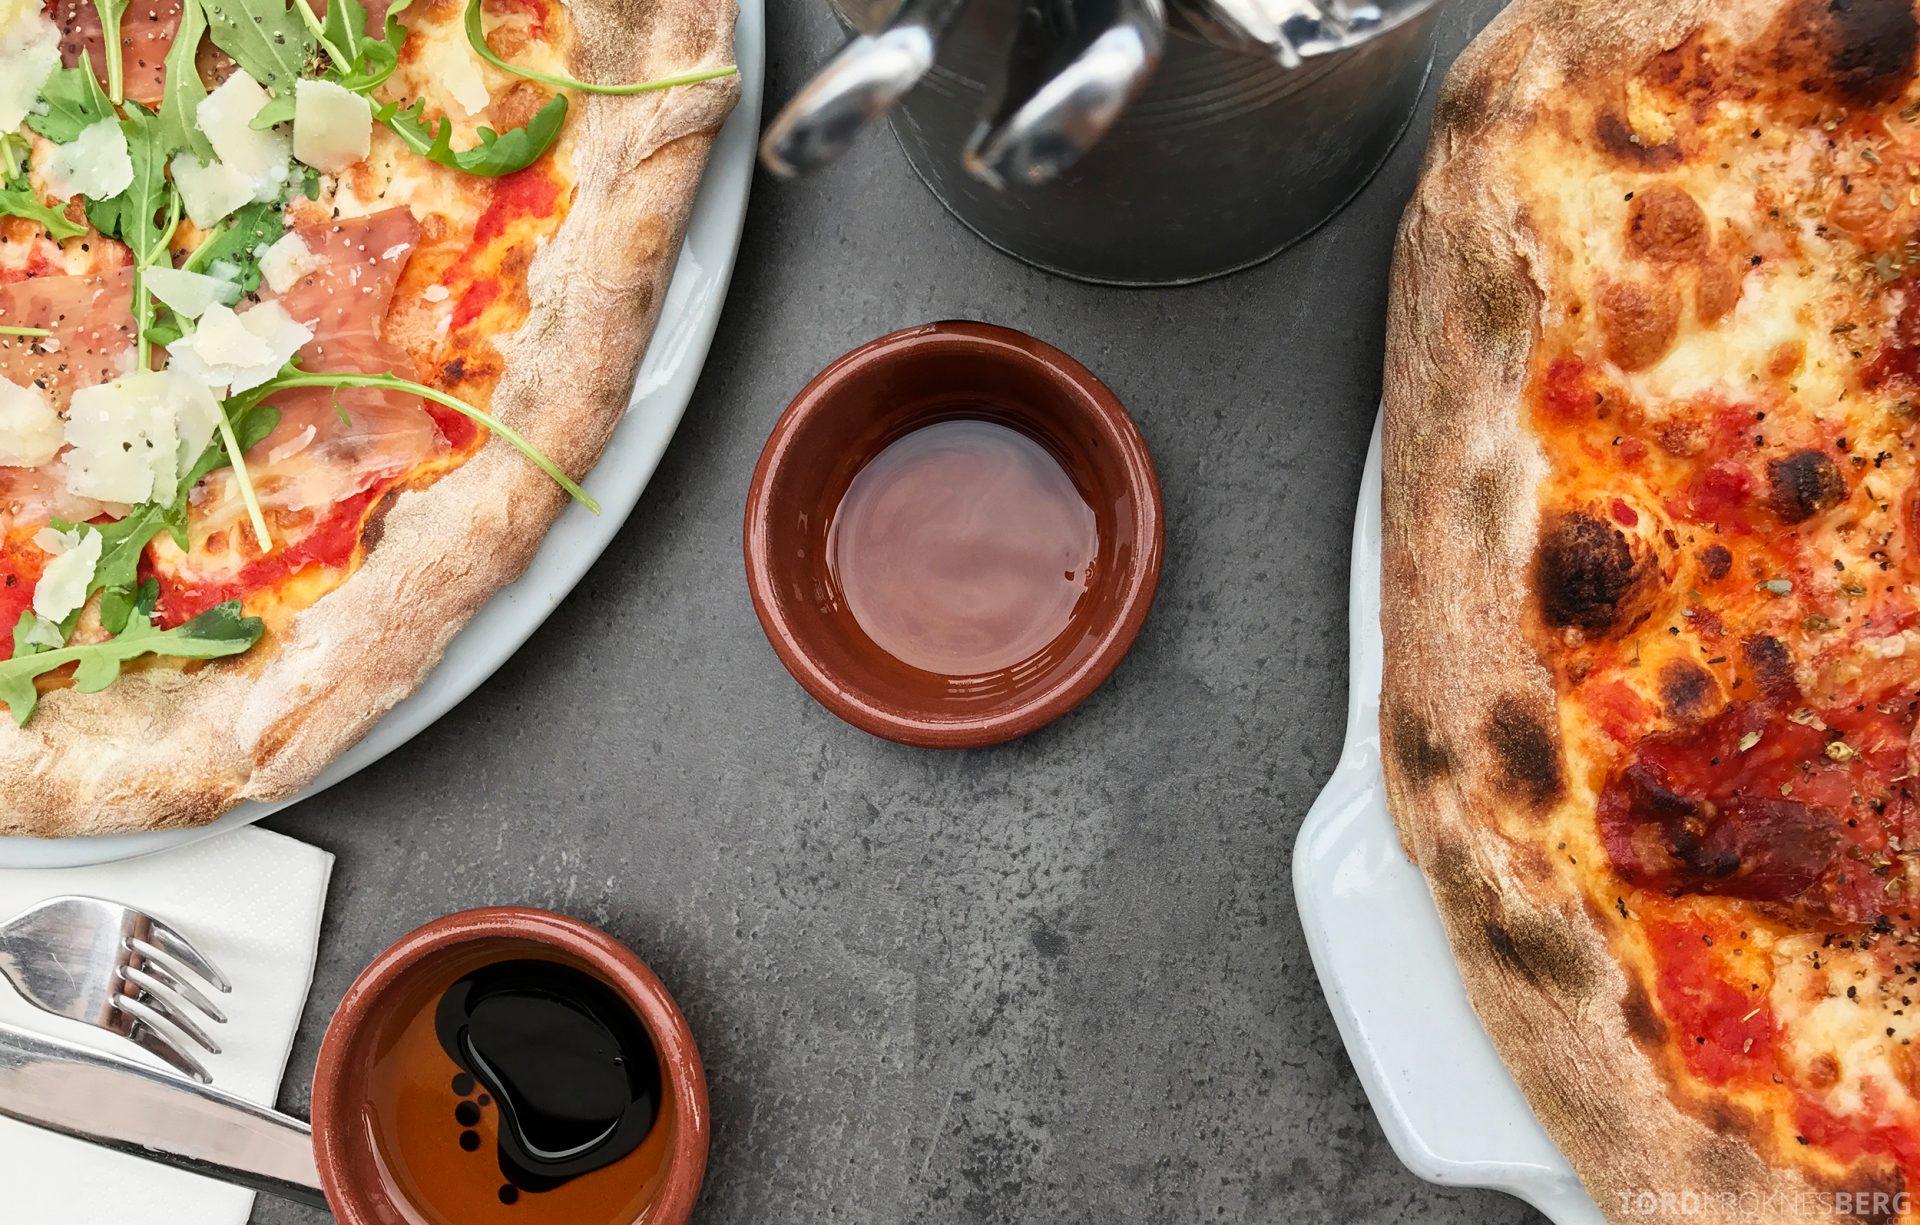 Jamie's Italian Aker Brygge Oslo